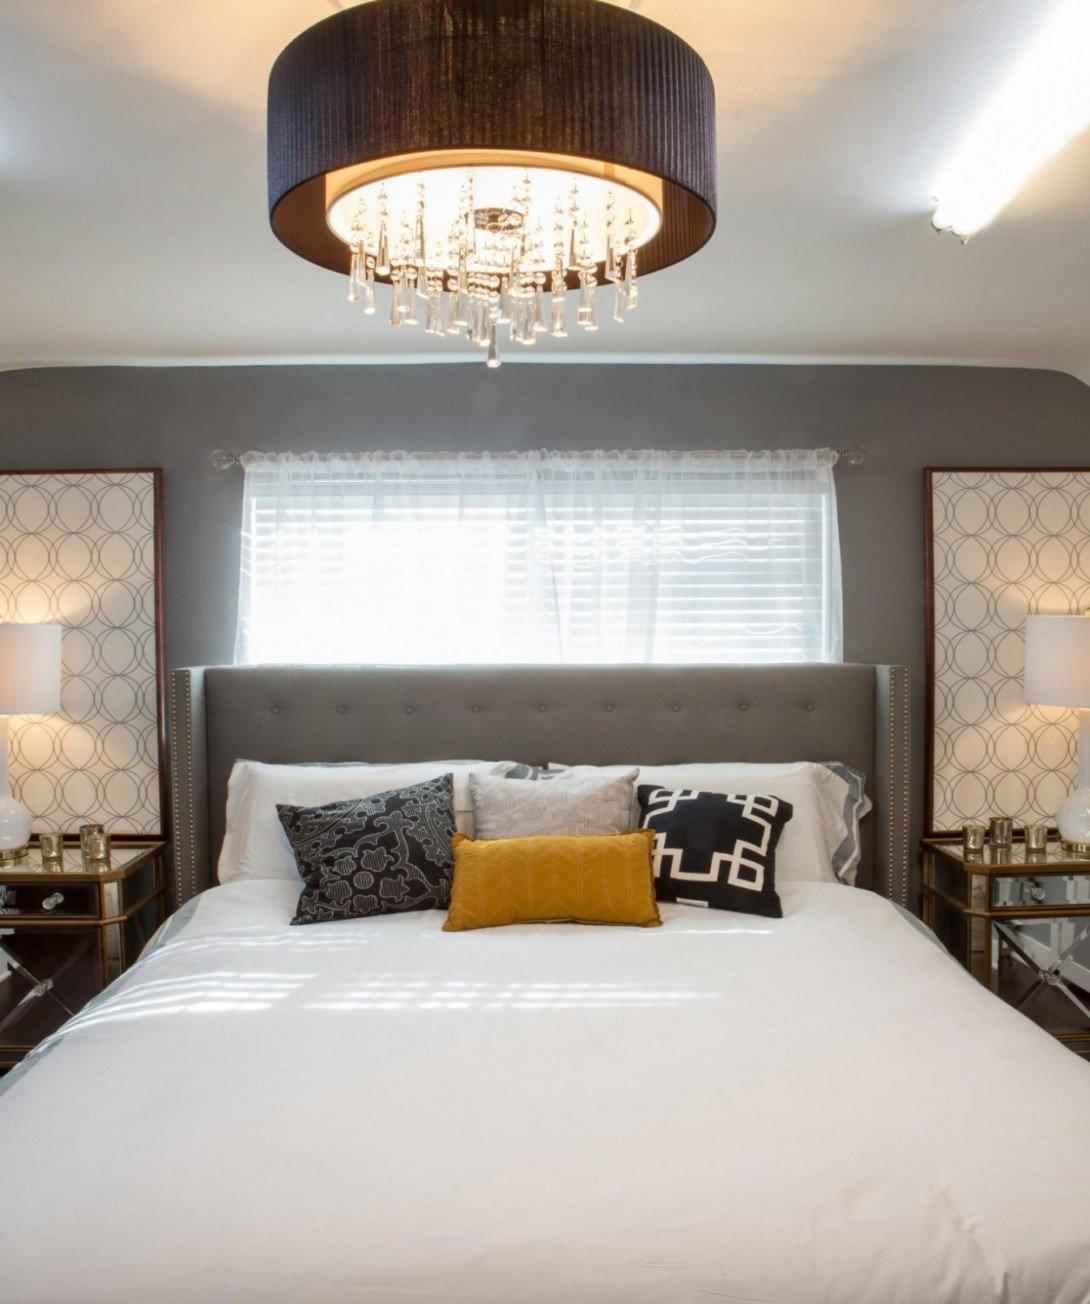 Bedroom Ceiling Light Ideas Inspirational Boys Small Bedroom Ideas Bedroom Ideas Kids Desk Tar Fresh